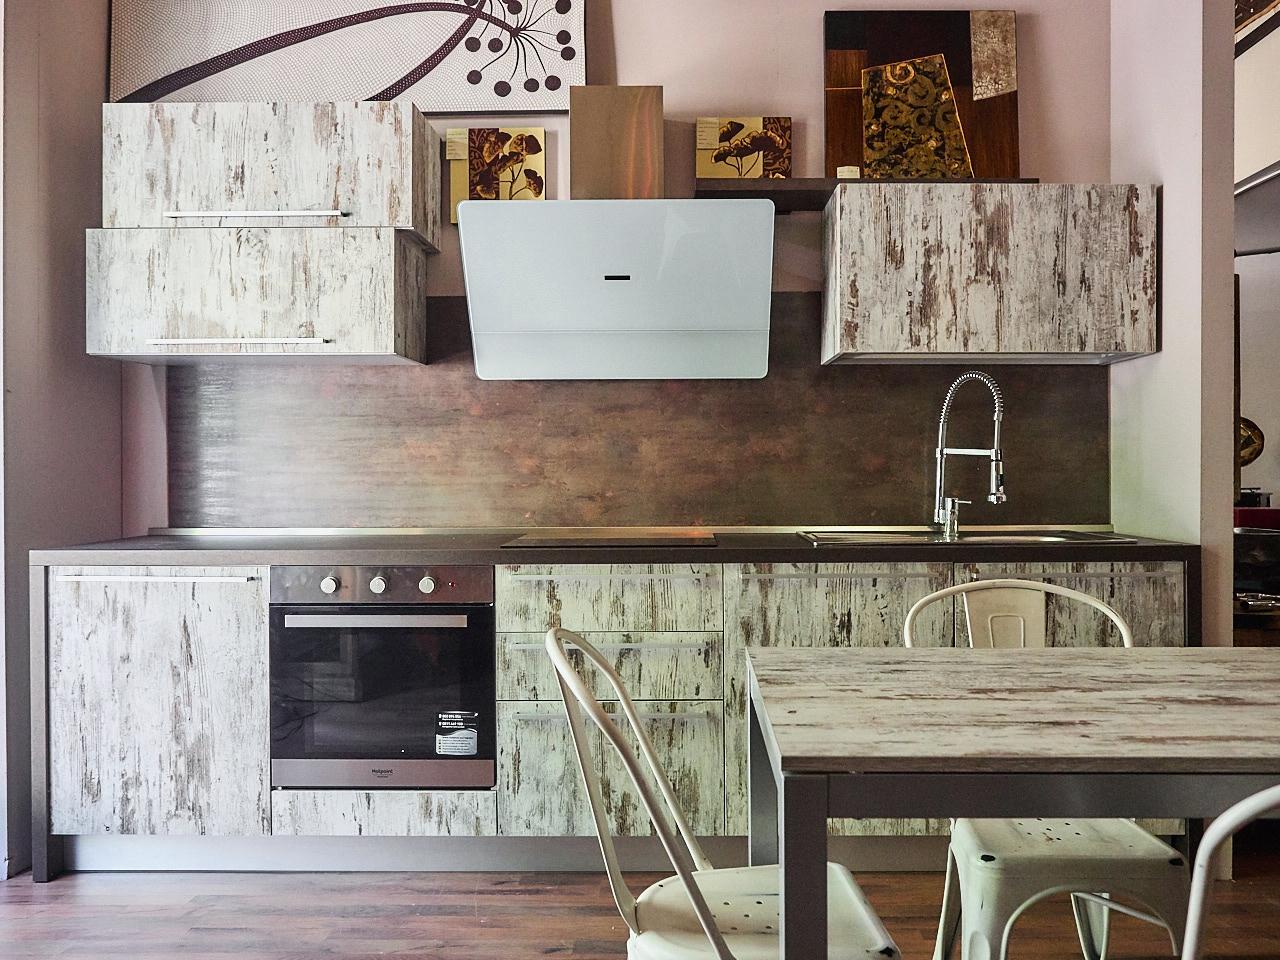 Cucina Moderna In Essenza : Cucina essenza vintage moderna in offerta outlet